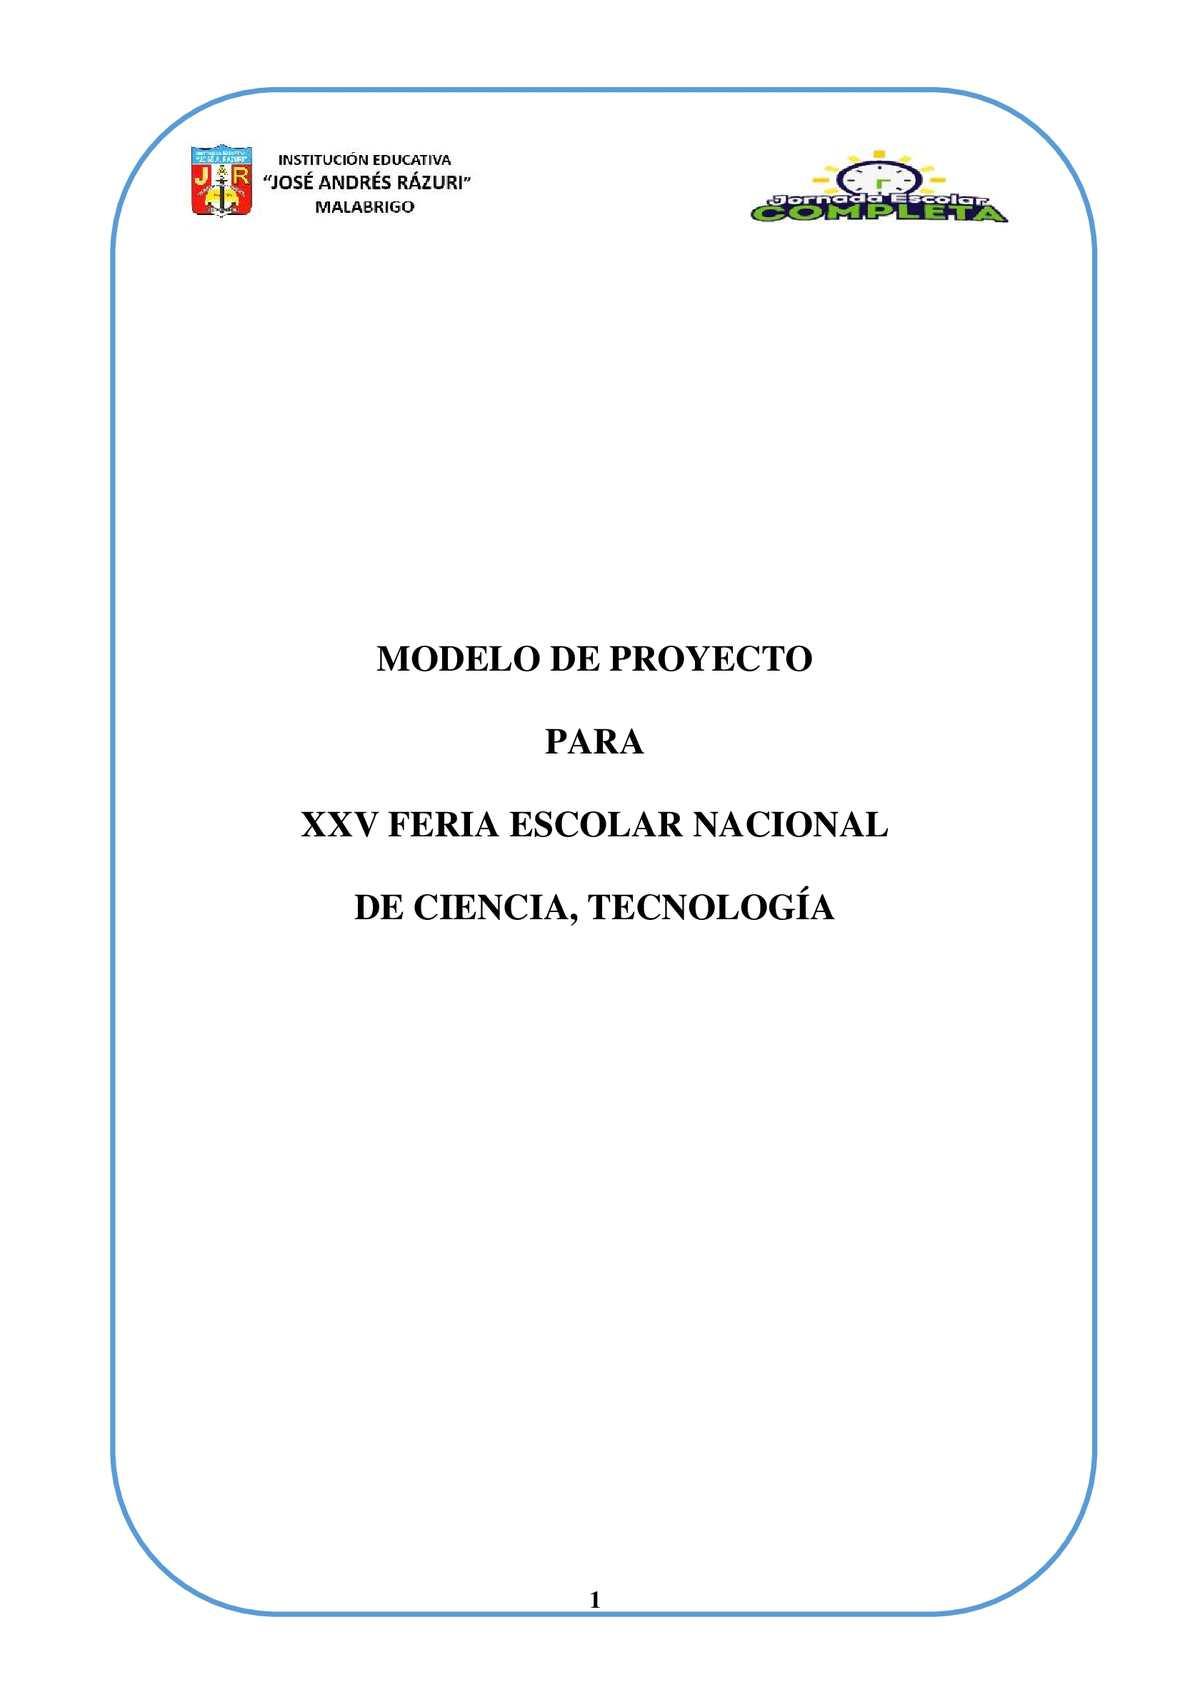 MODELO DE PROYECTO EUREKA 2015